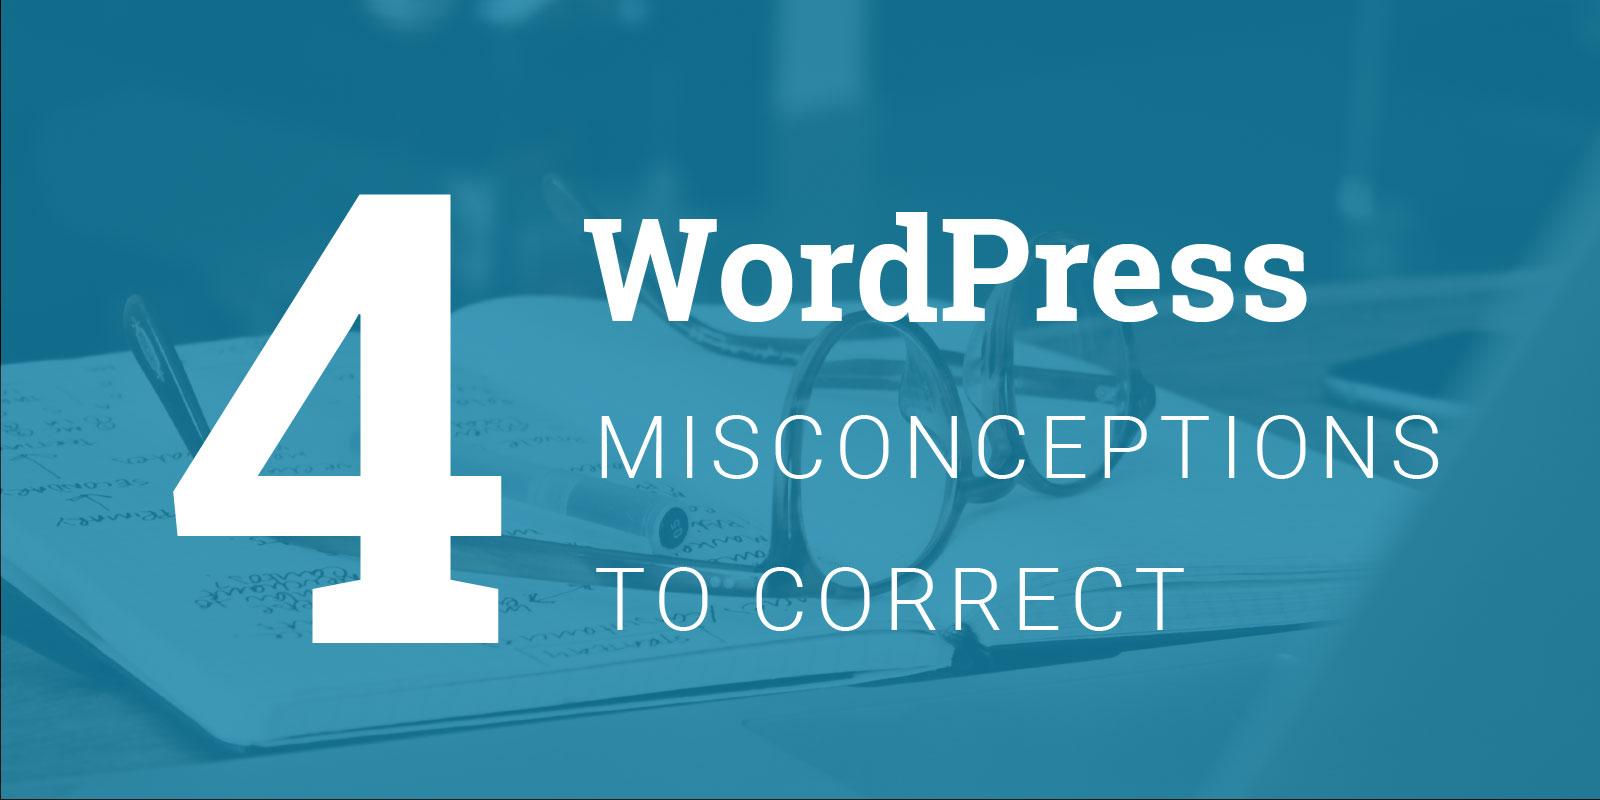 wordpress-misconceptions.jpg